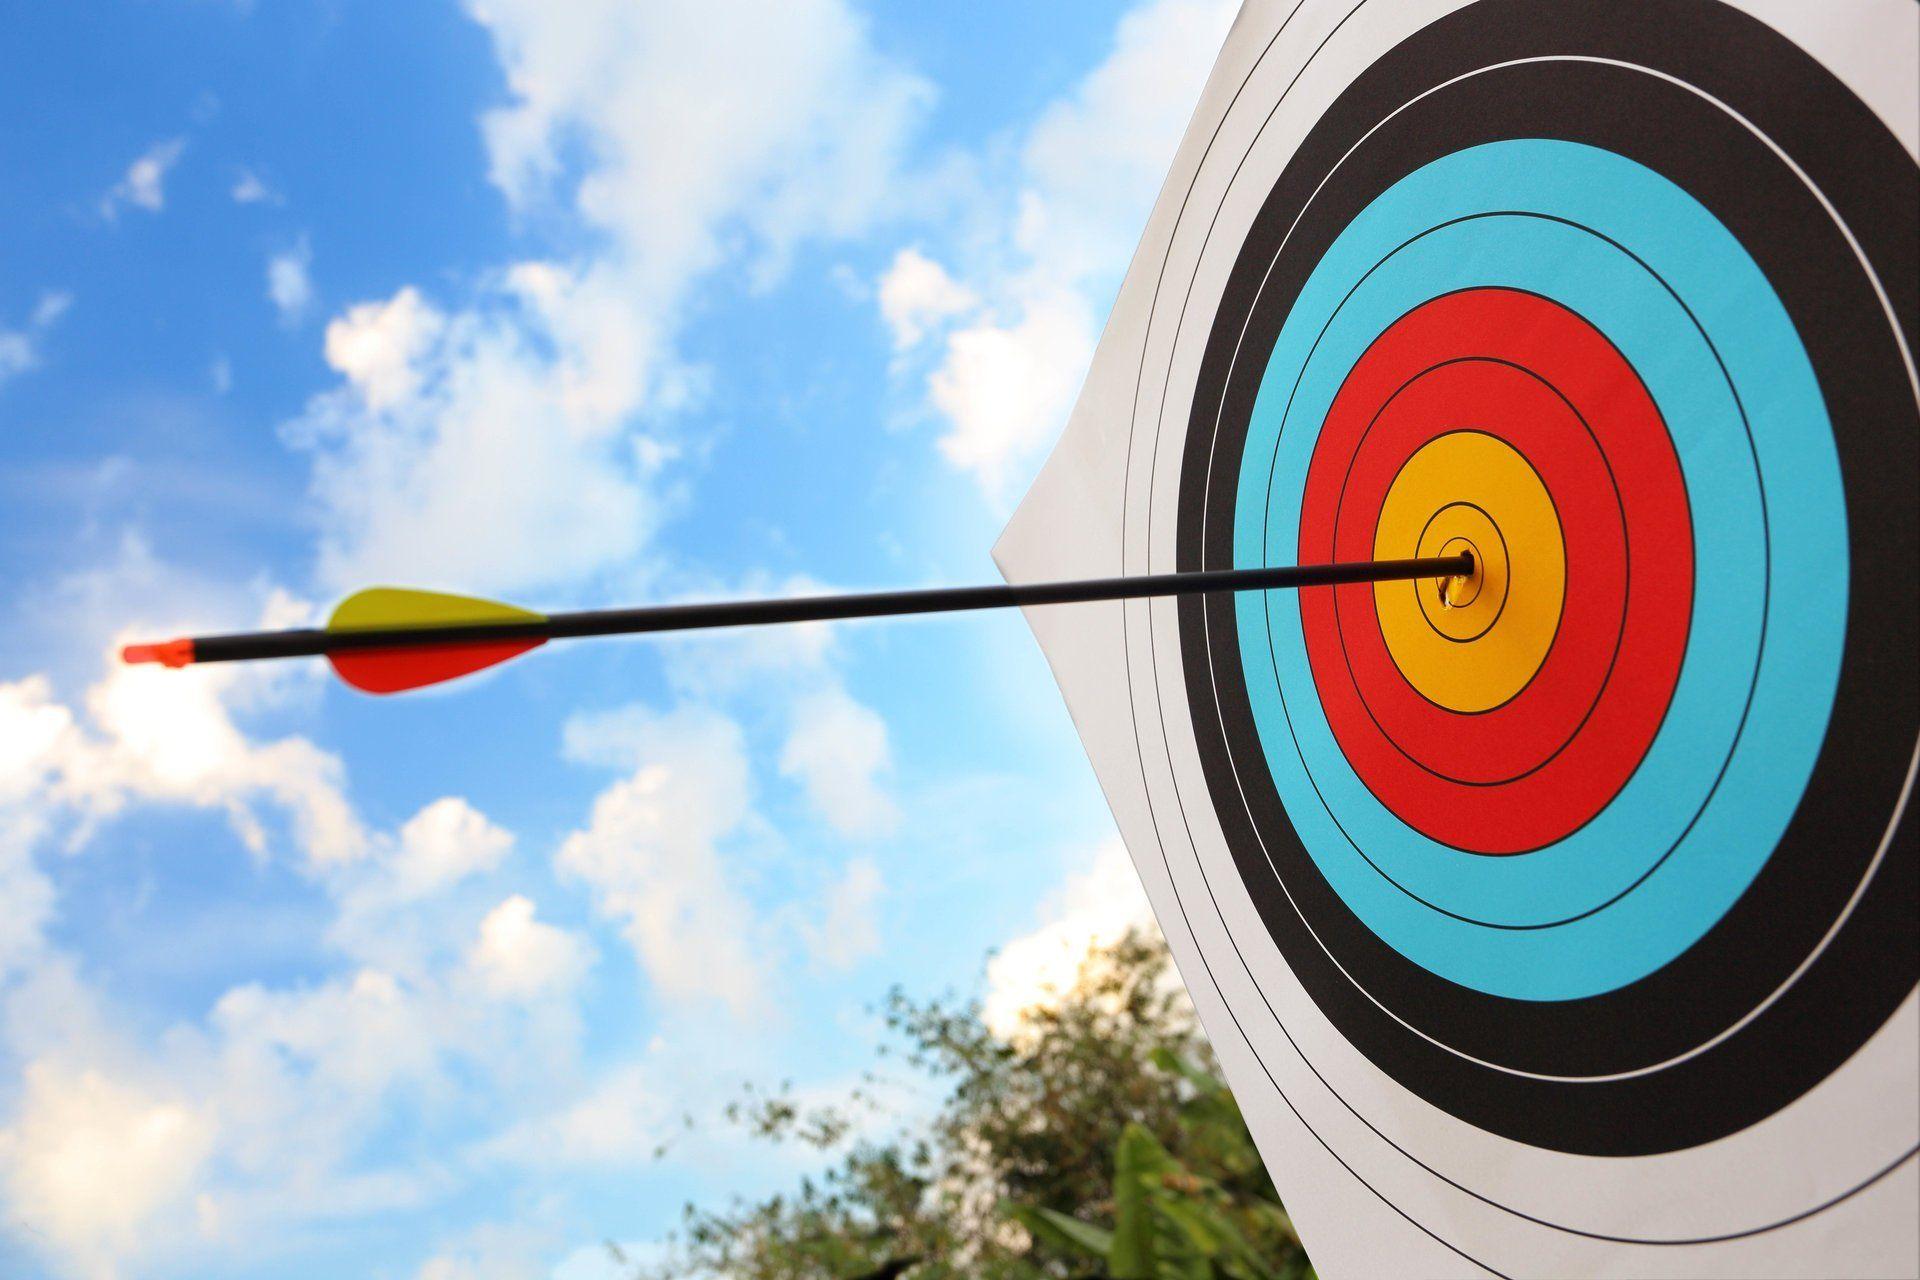 BULL'S EYE! Animal Catch Phrases Archery hunting